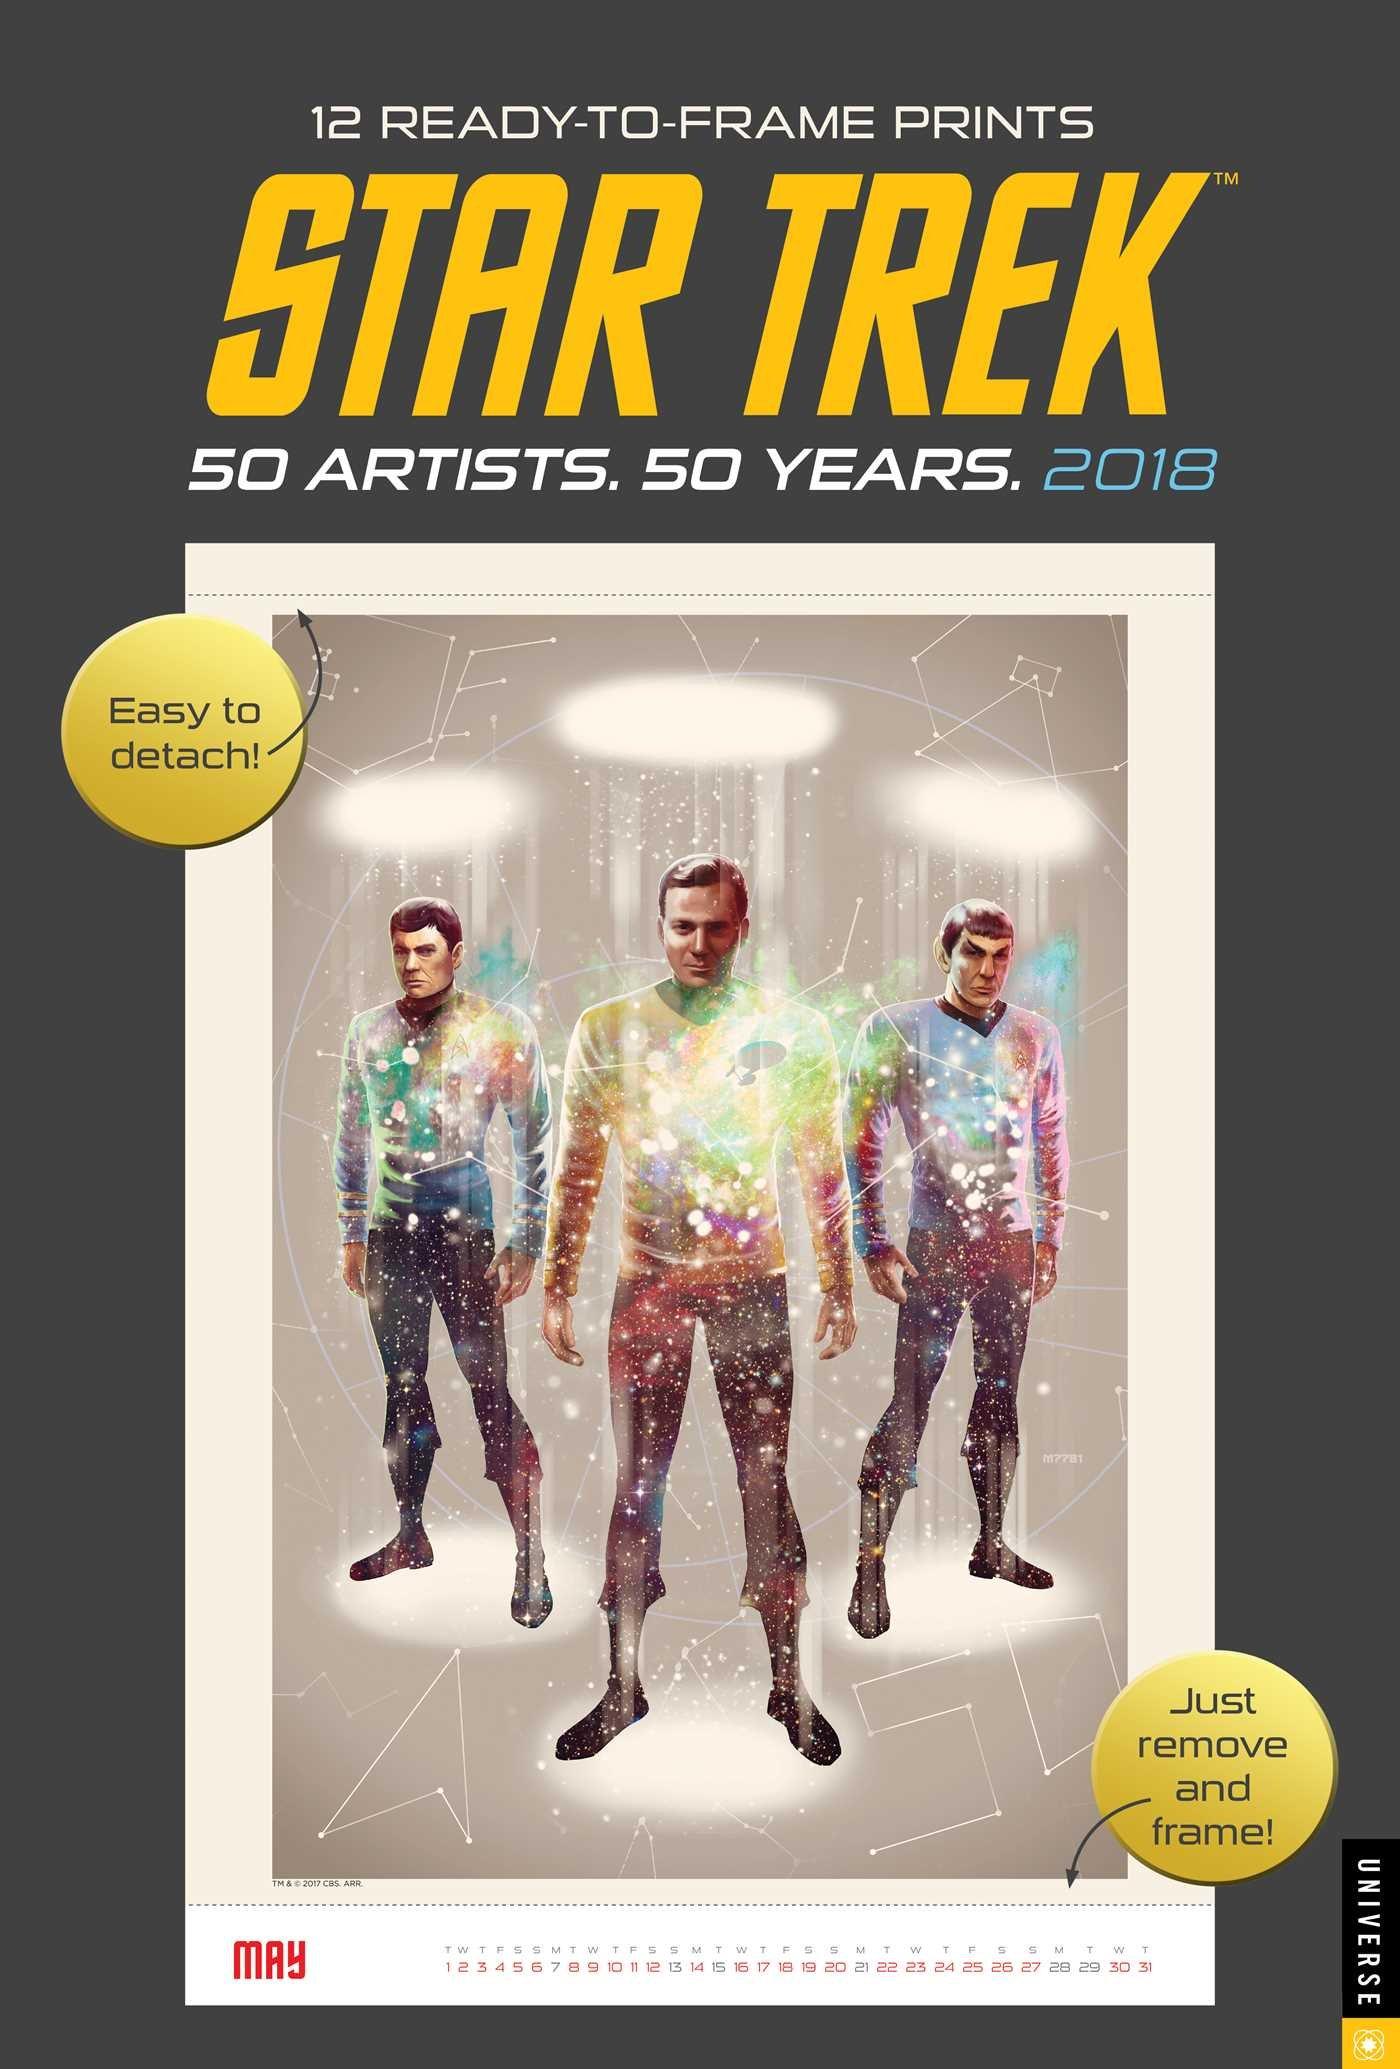 Star Trek 2018 Poster Calendar: 50 Artists. 50 Years. ebook